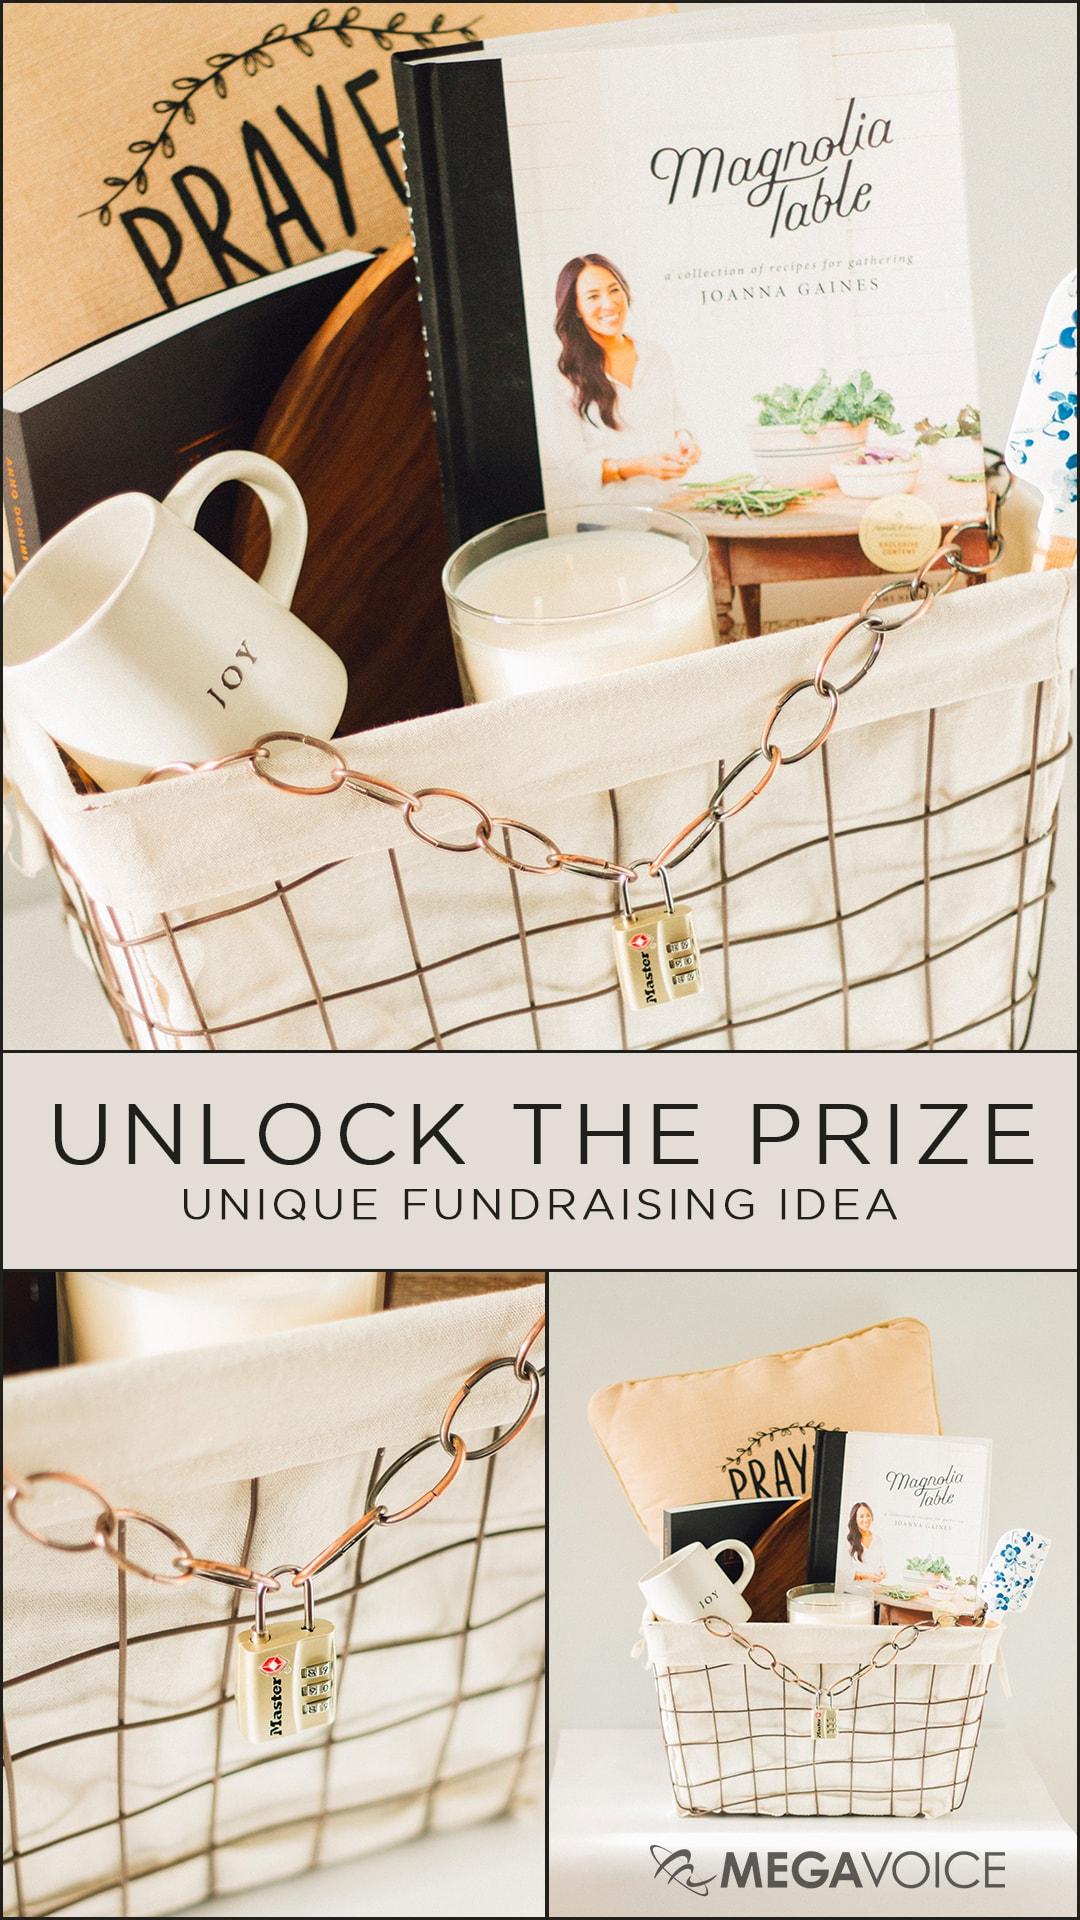 fundraising-pin 4-image